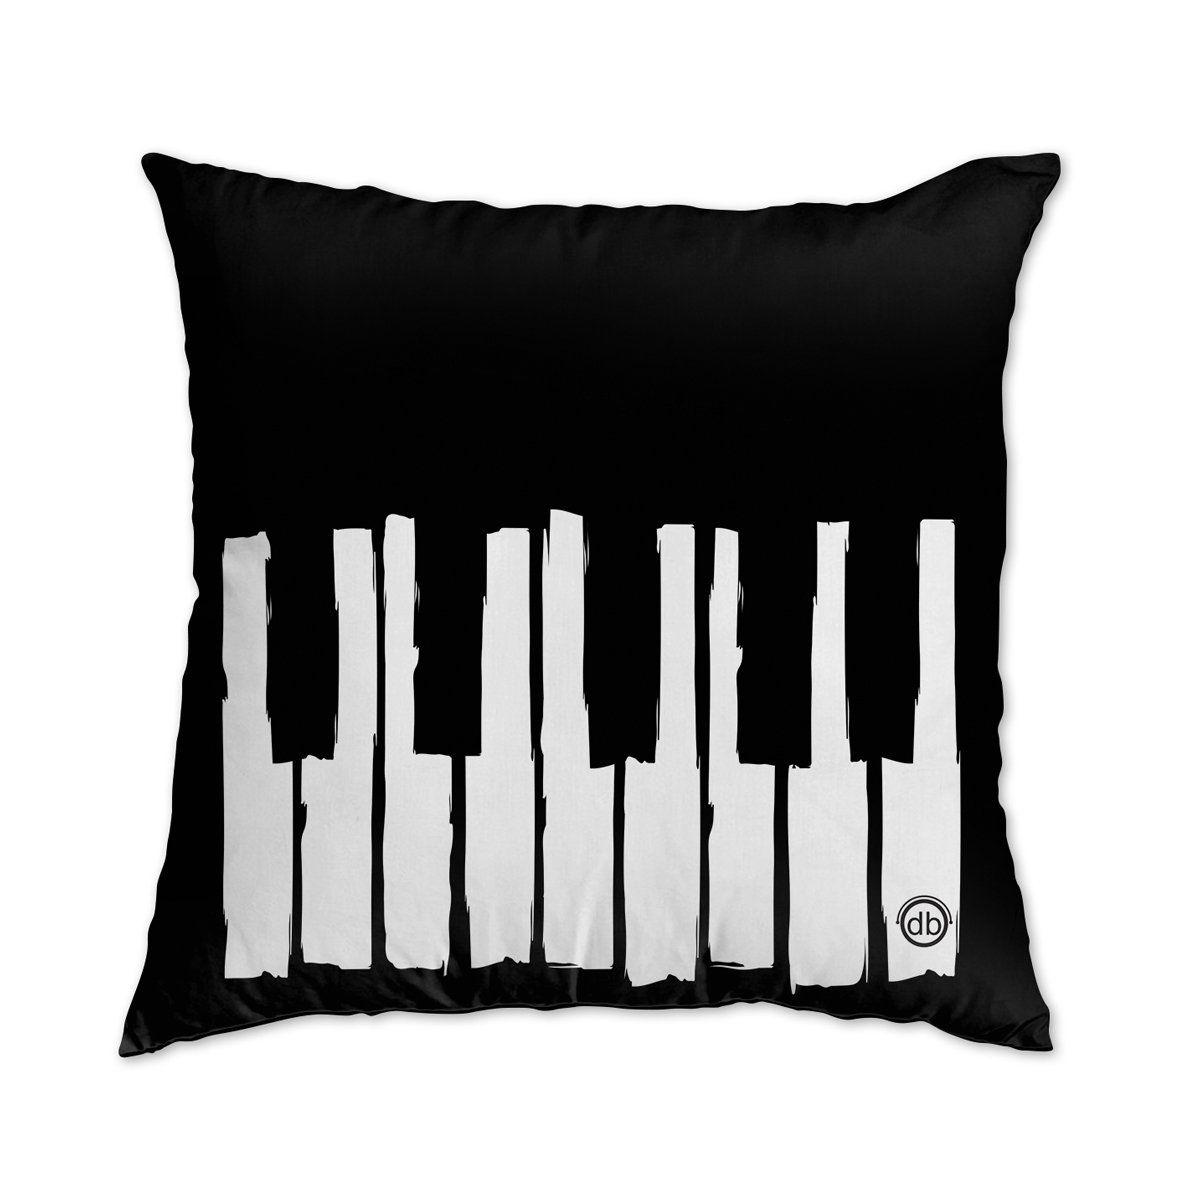 Almofada Dudu Borges Musical Keyboard  - bandUP Store Marketplace